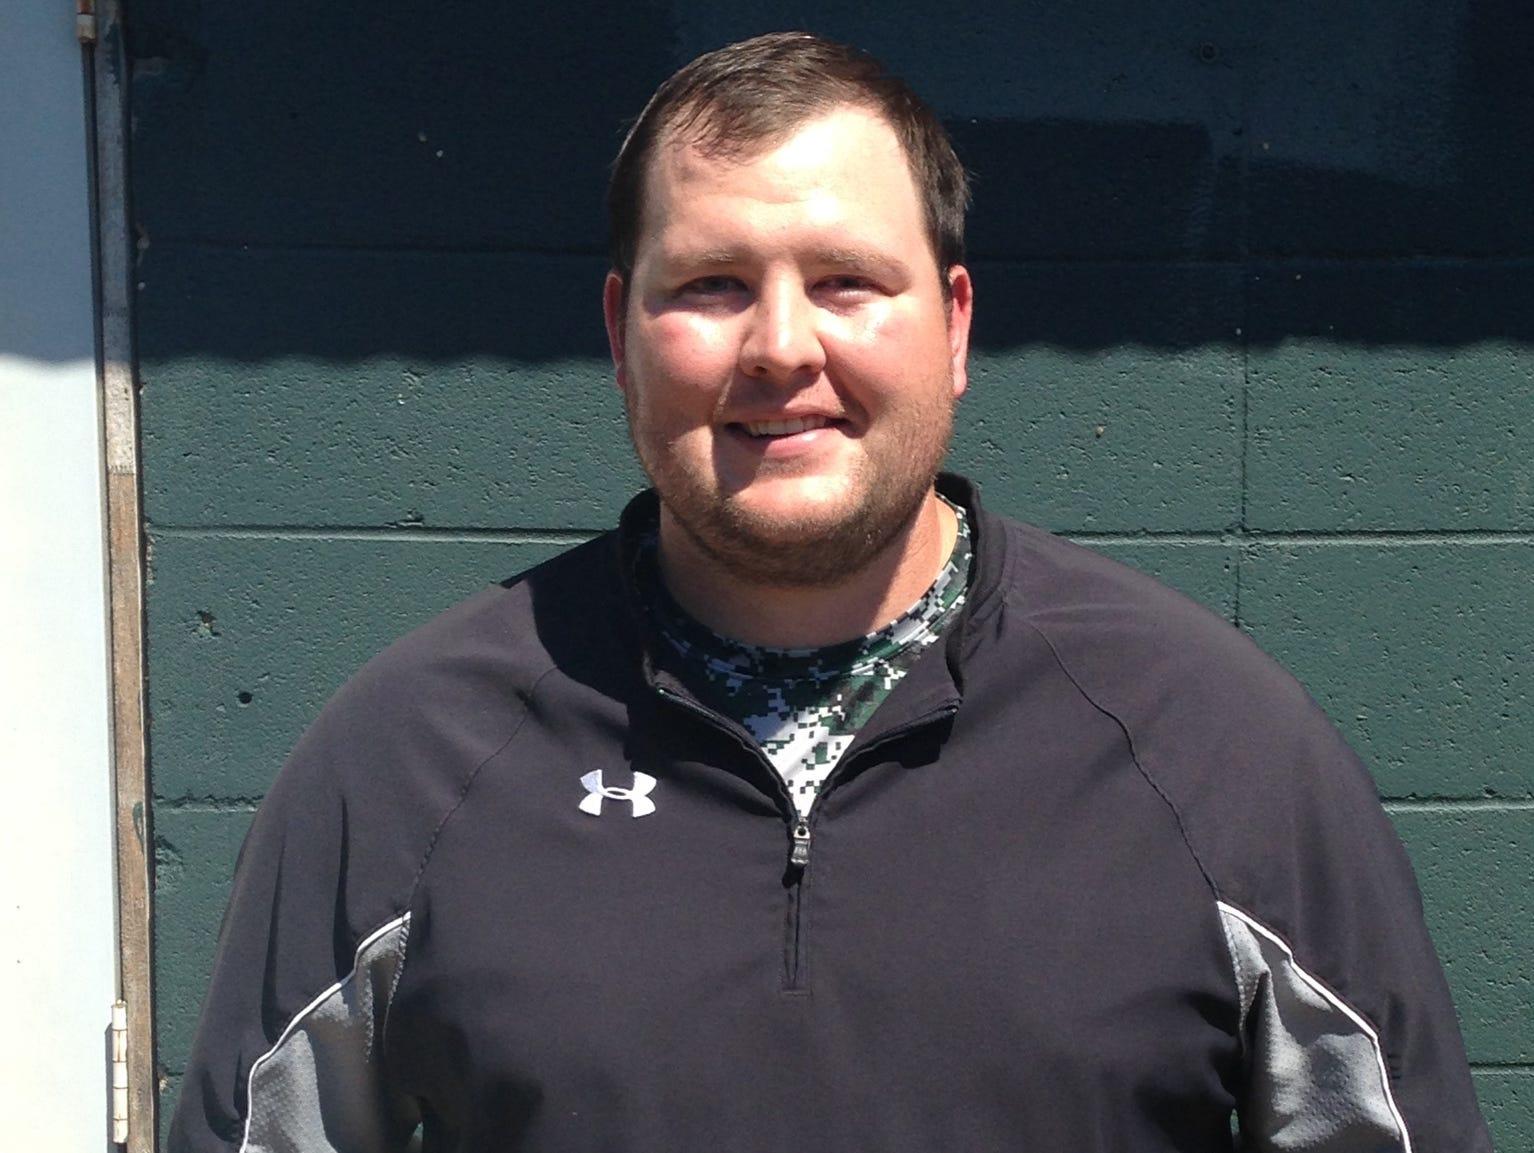 Colton Knuckols is Rapides' new baseball coach.